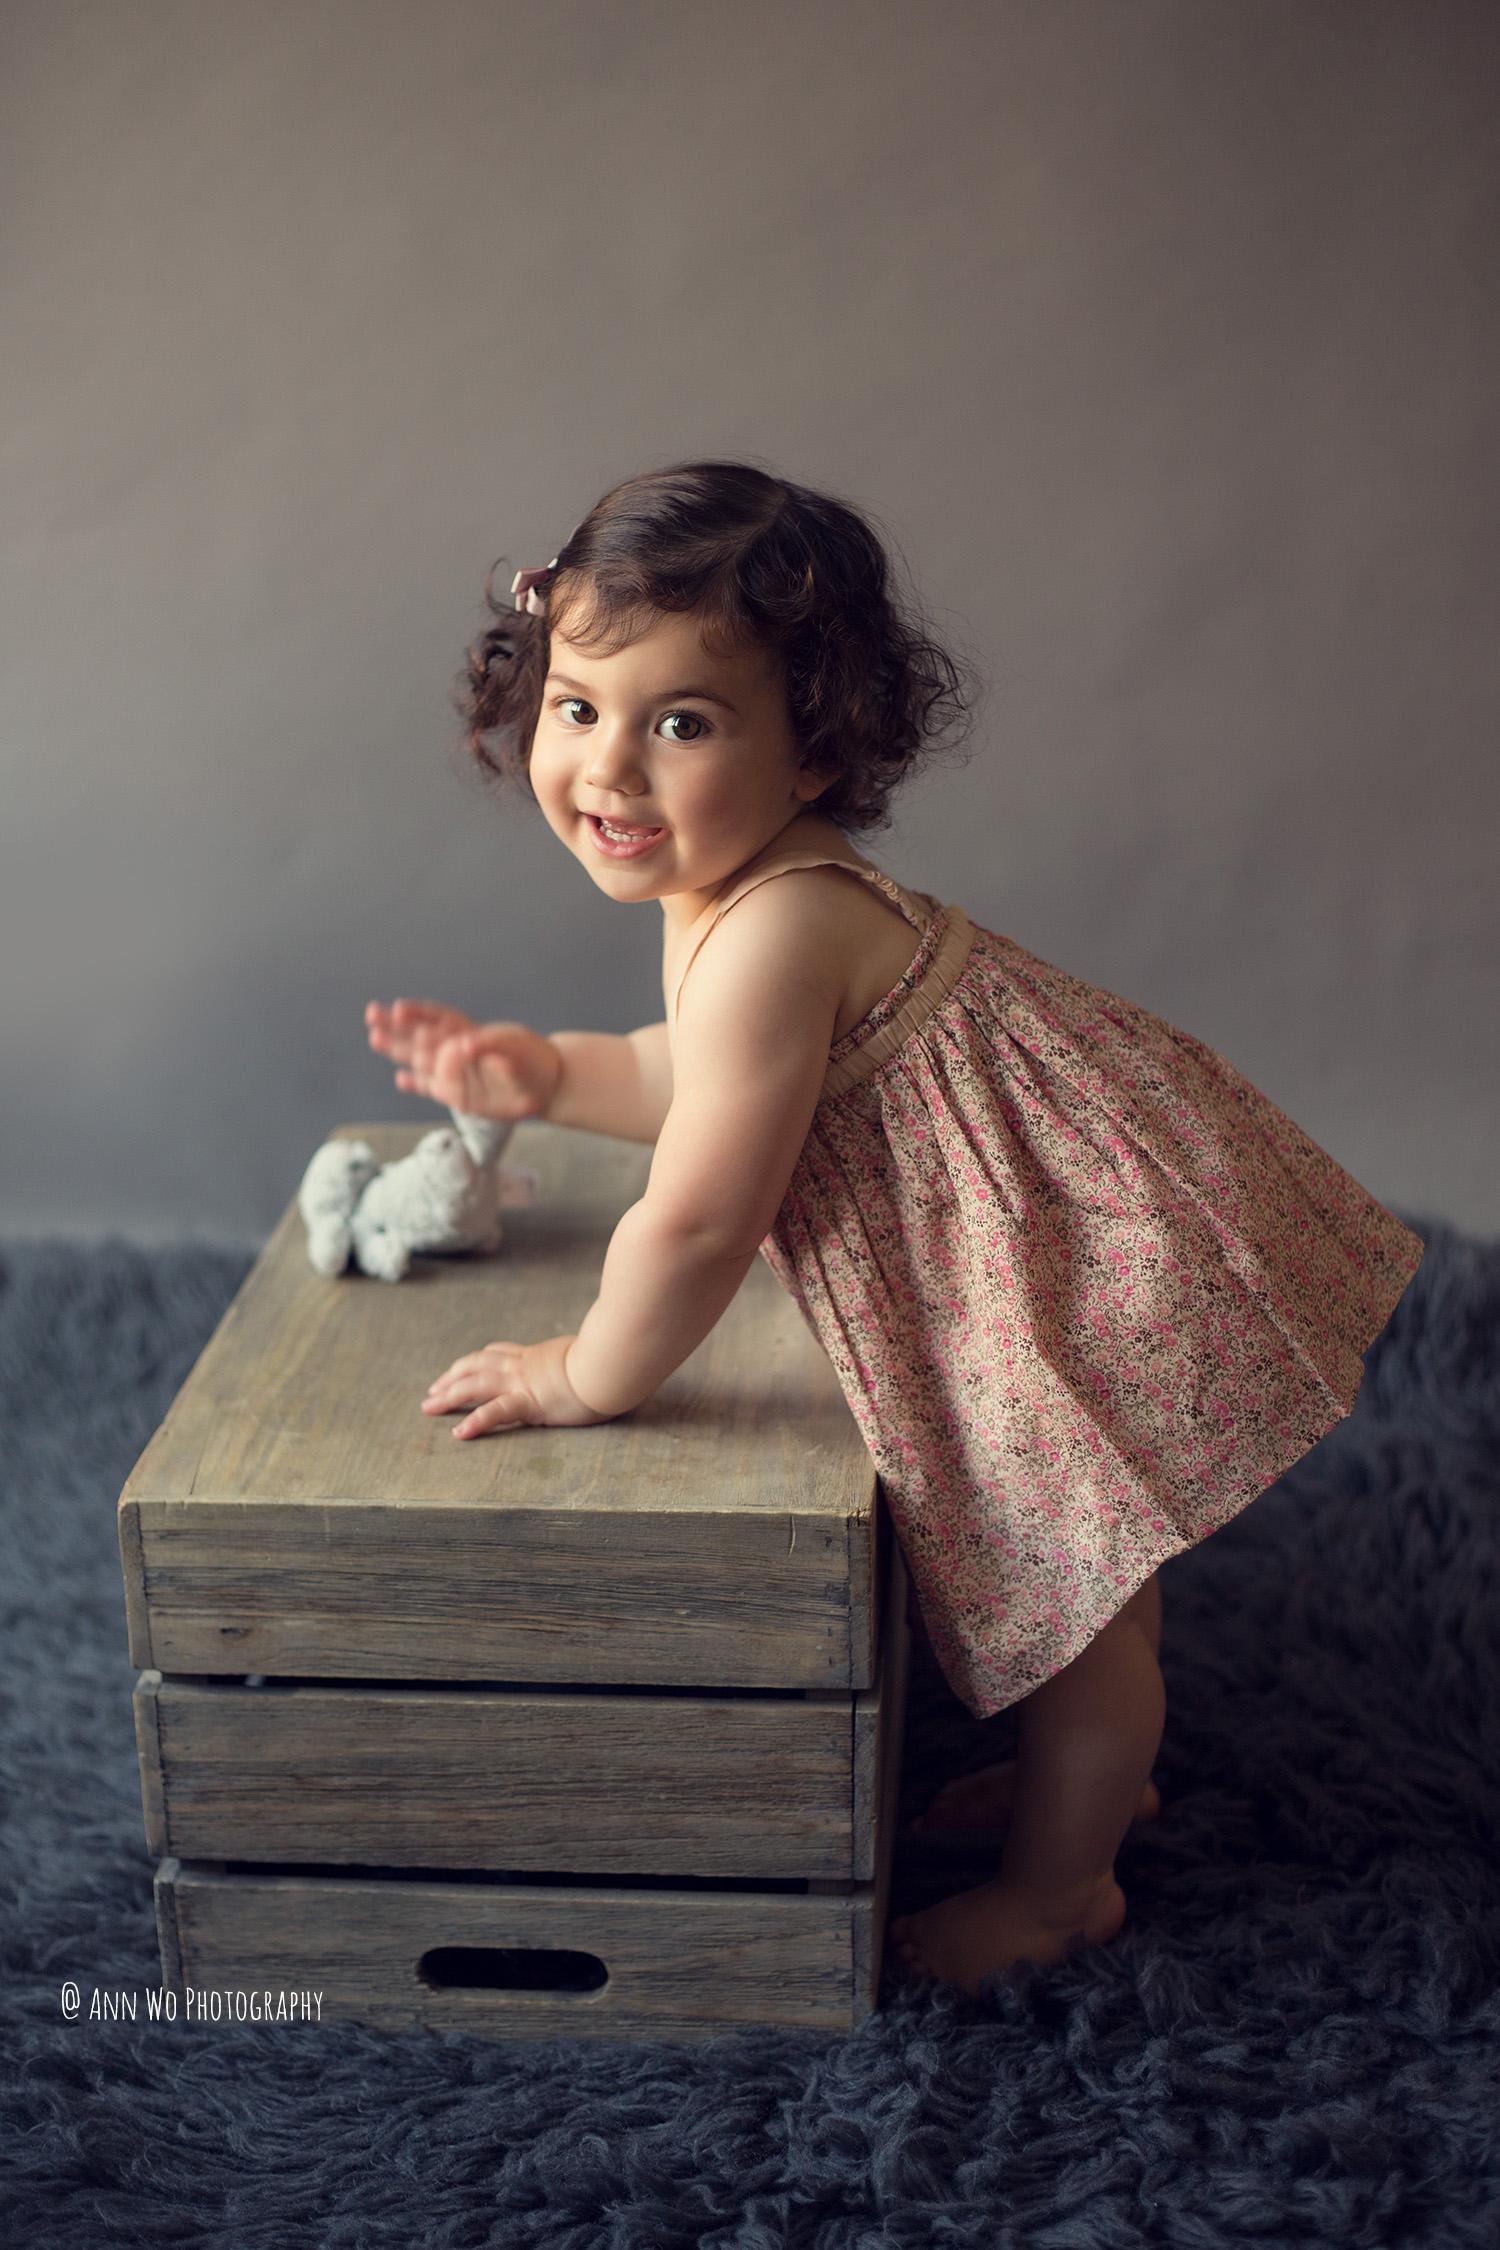 ann-wo-baby-photographer-london-nw03.jpg